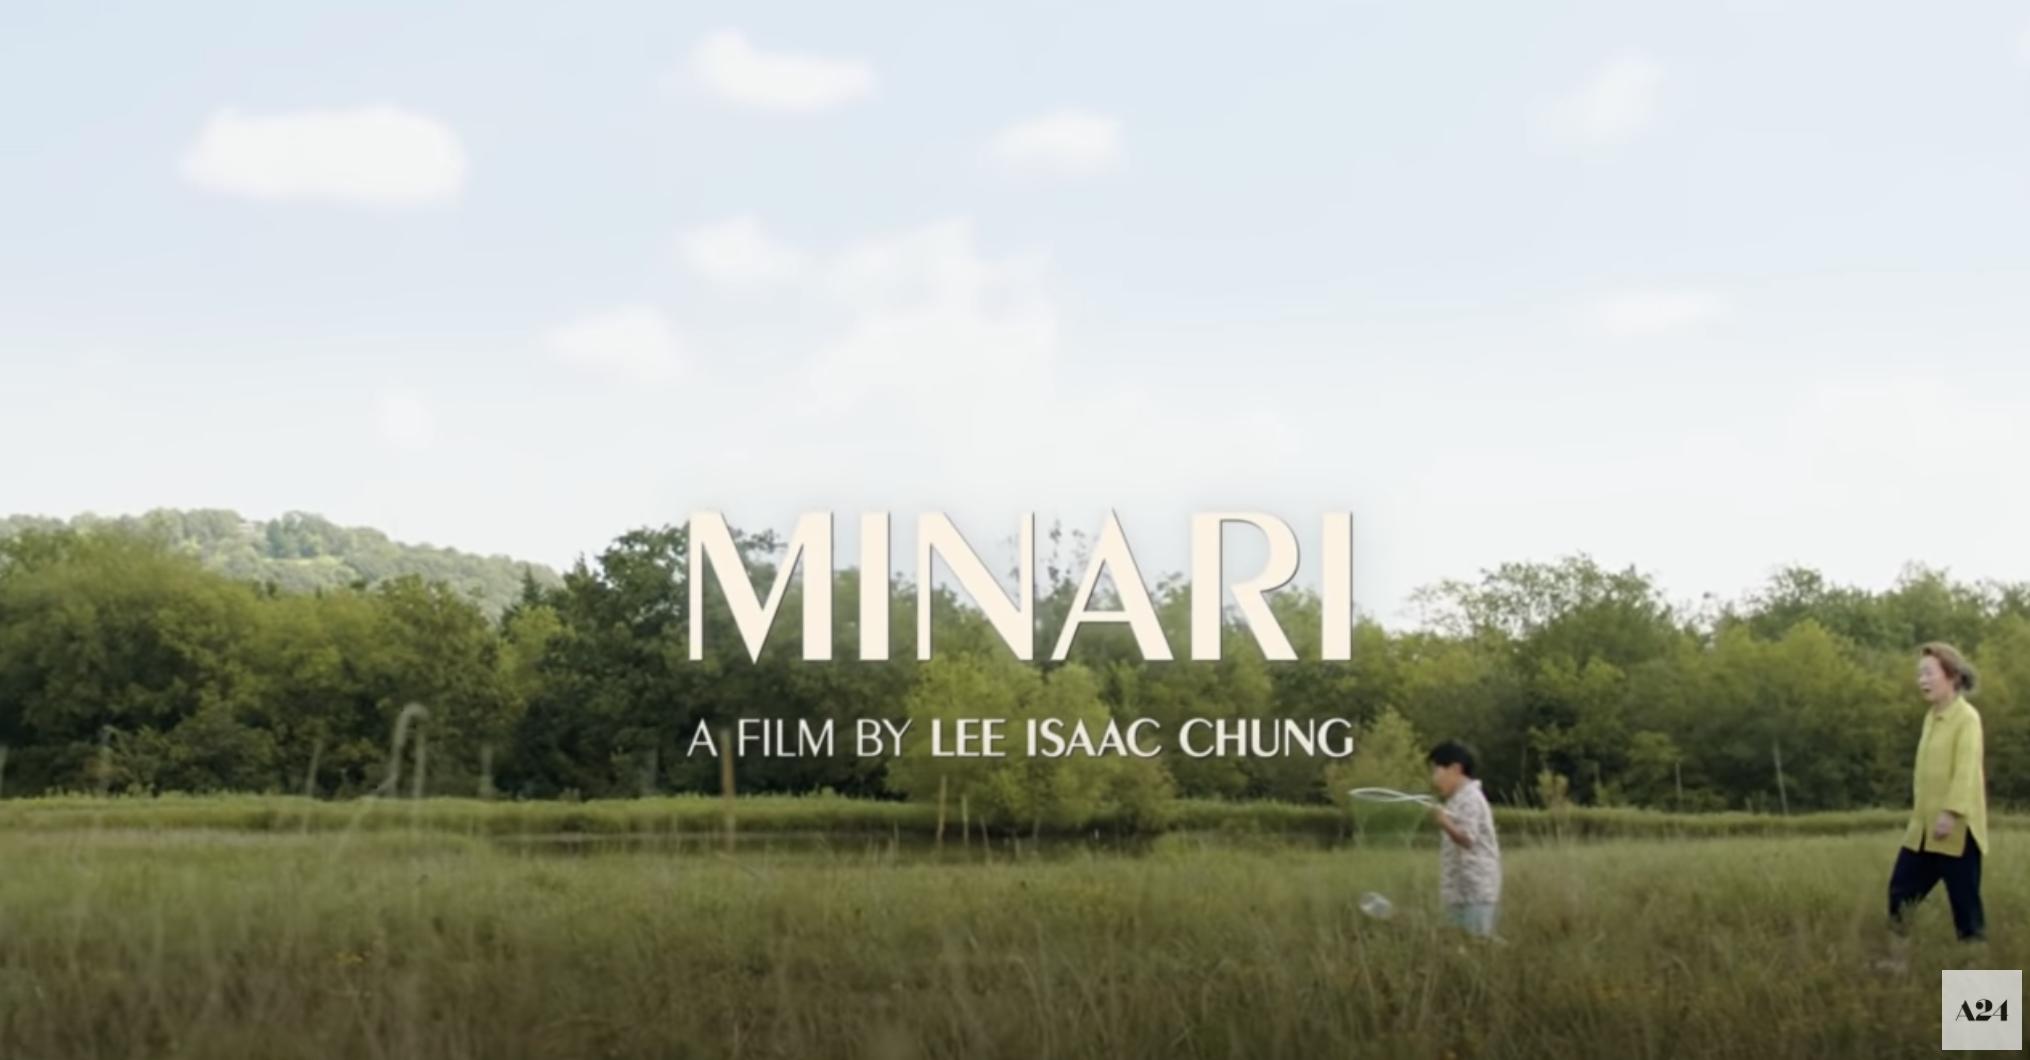 Minari title screen